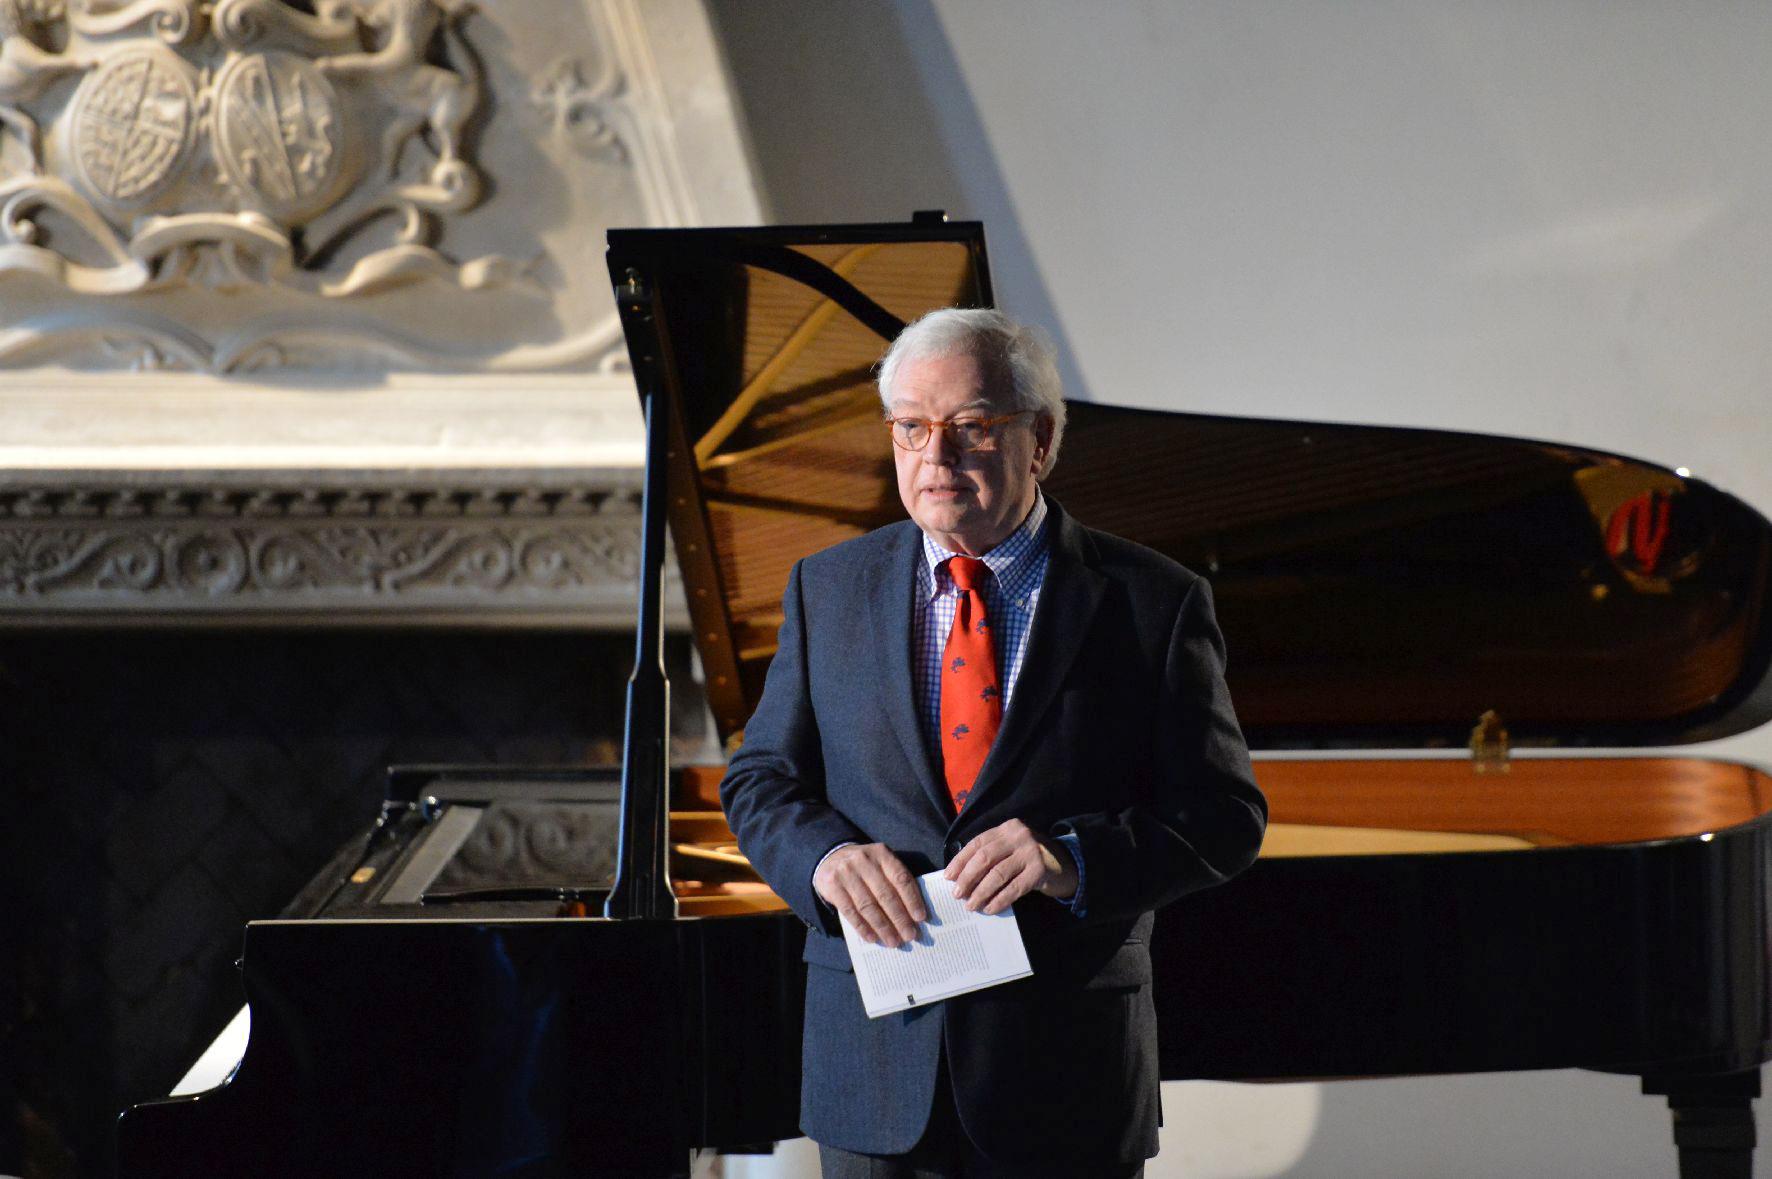 Intendant Michael Herrmann begrüßt das Konzertpublikum